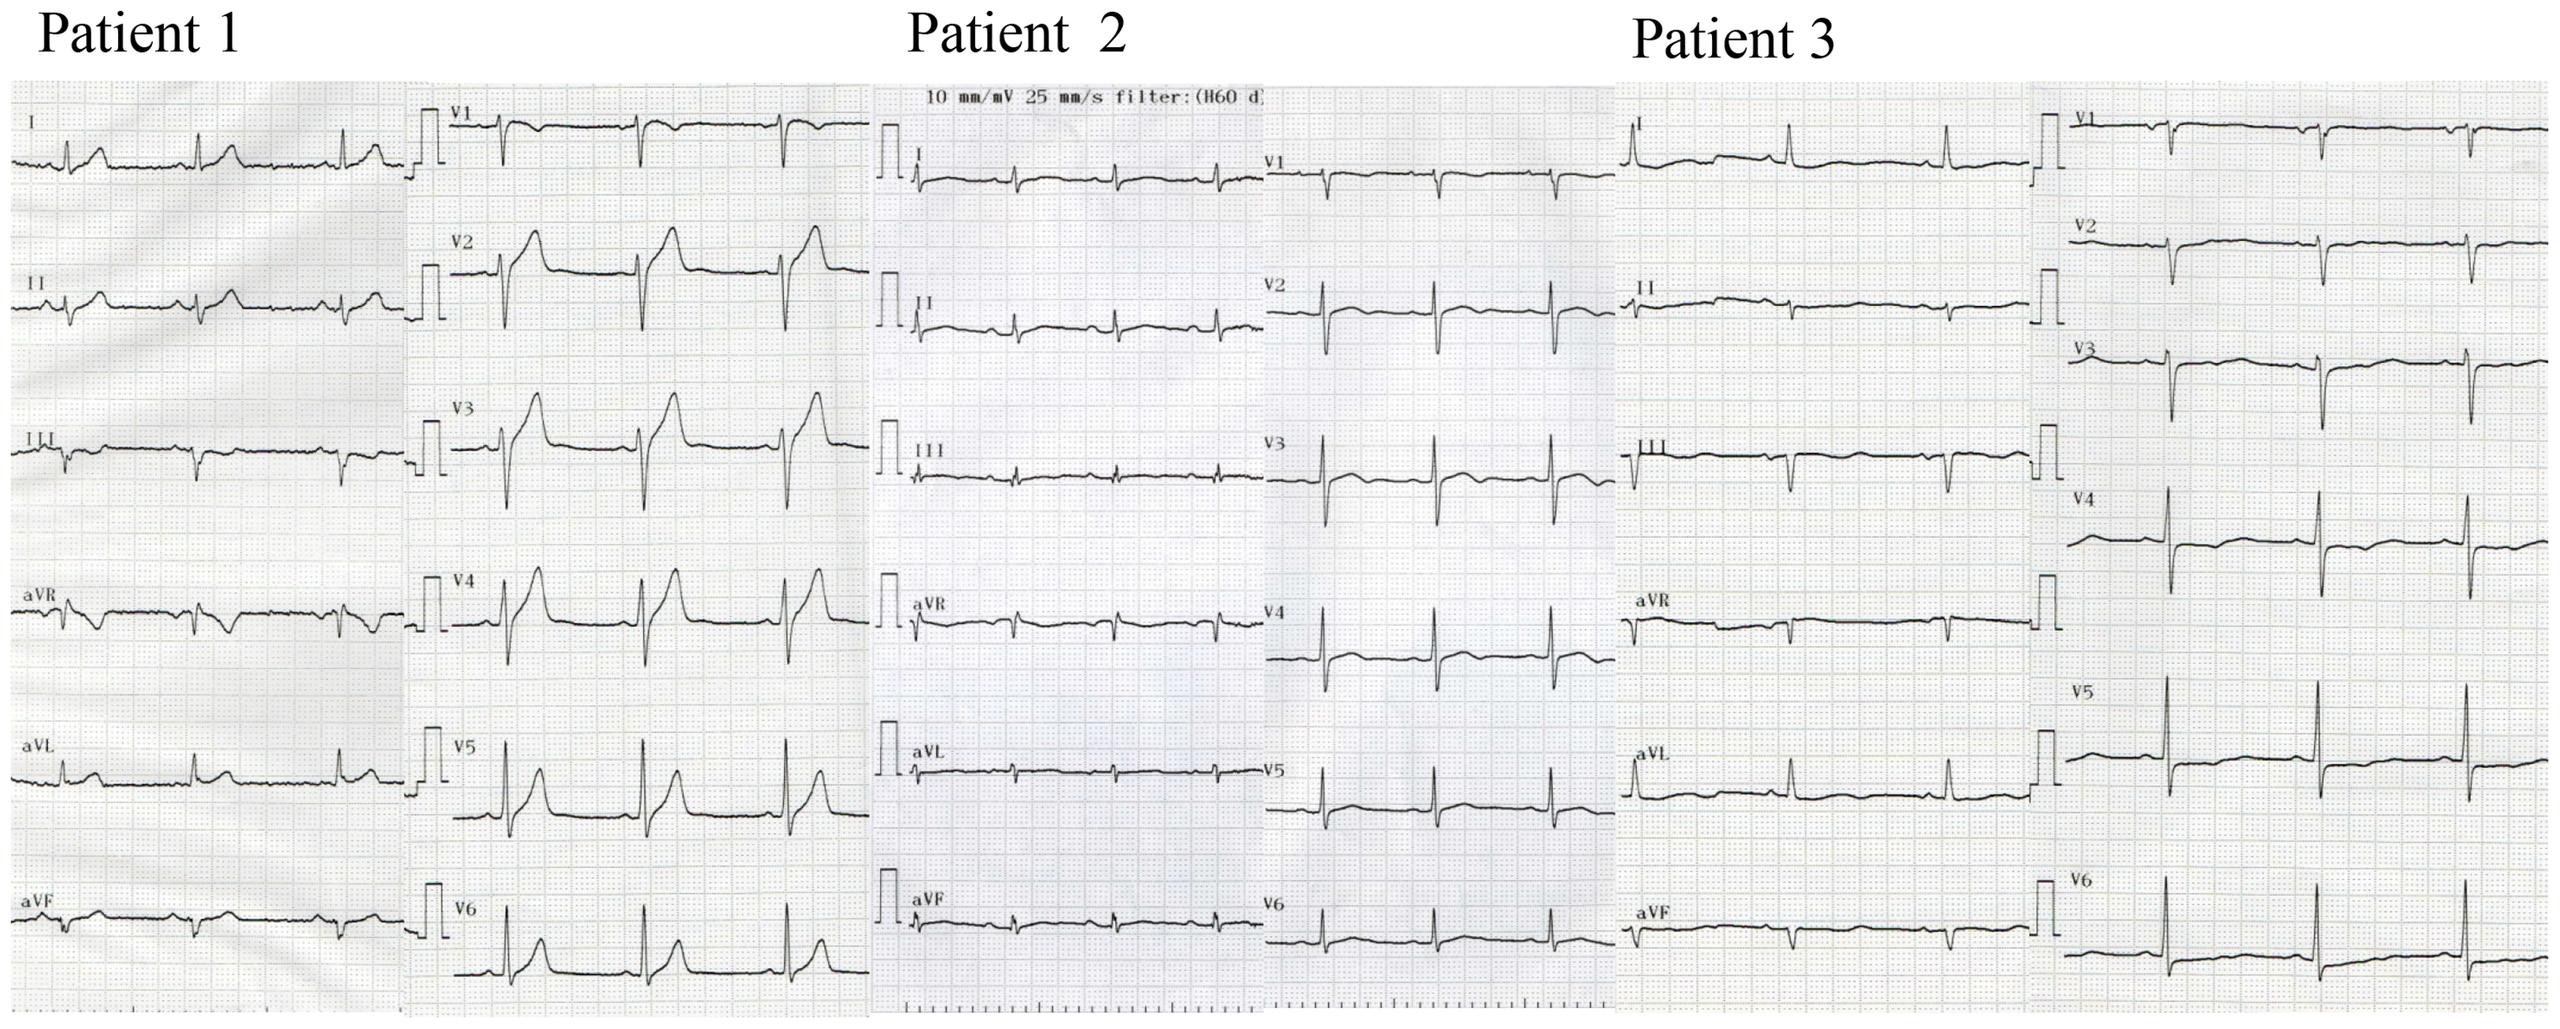 Twelve-lead ECG of patients with <i>SEMA3A</i><sup>I334V</sup>.